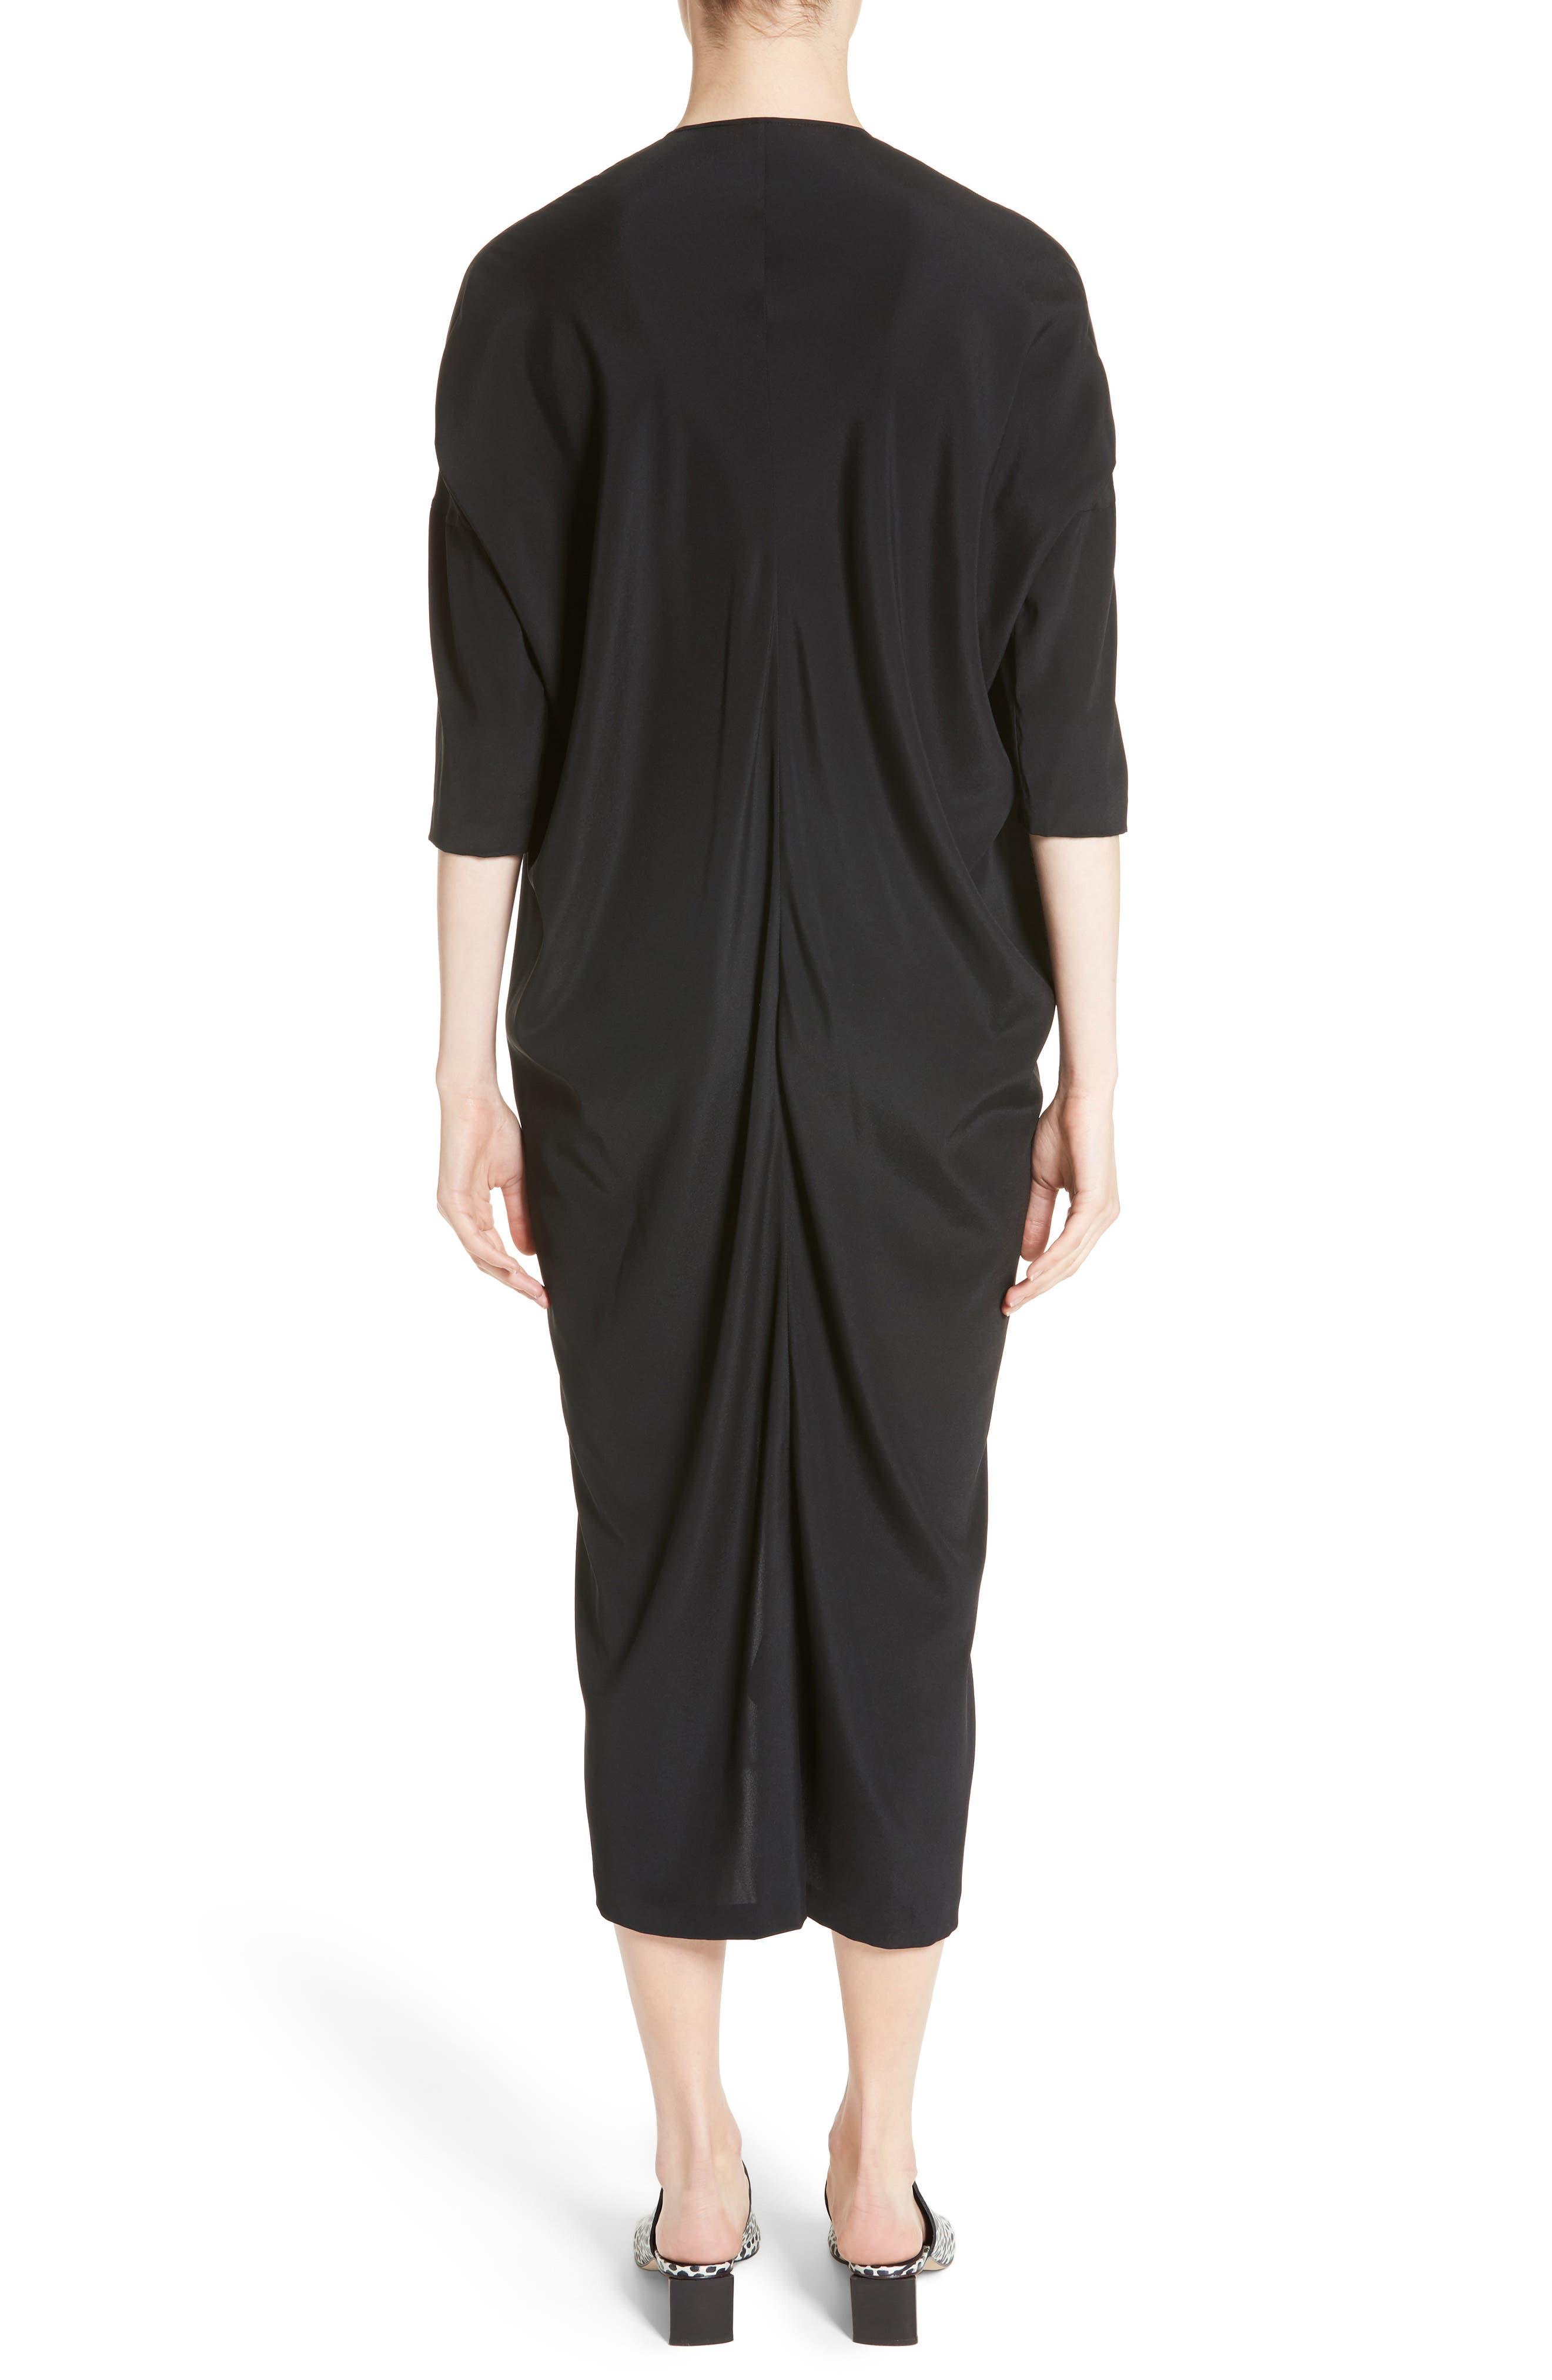 Koya Stretch Silk Charmeuse Dress,                             Alternate thumbnail 2, color,                             001